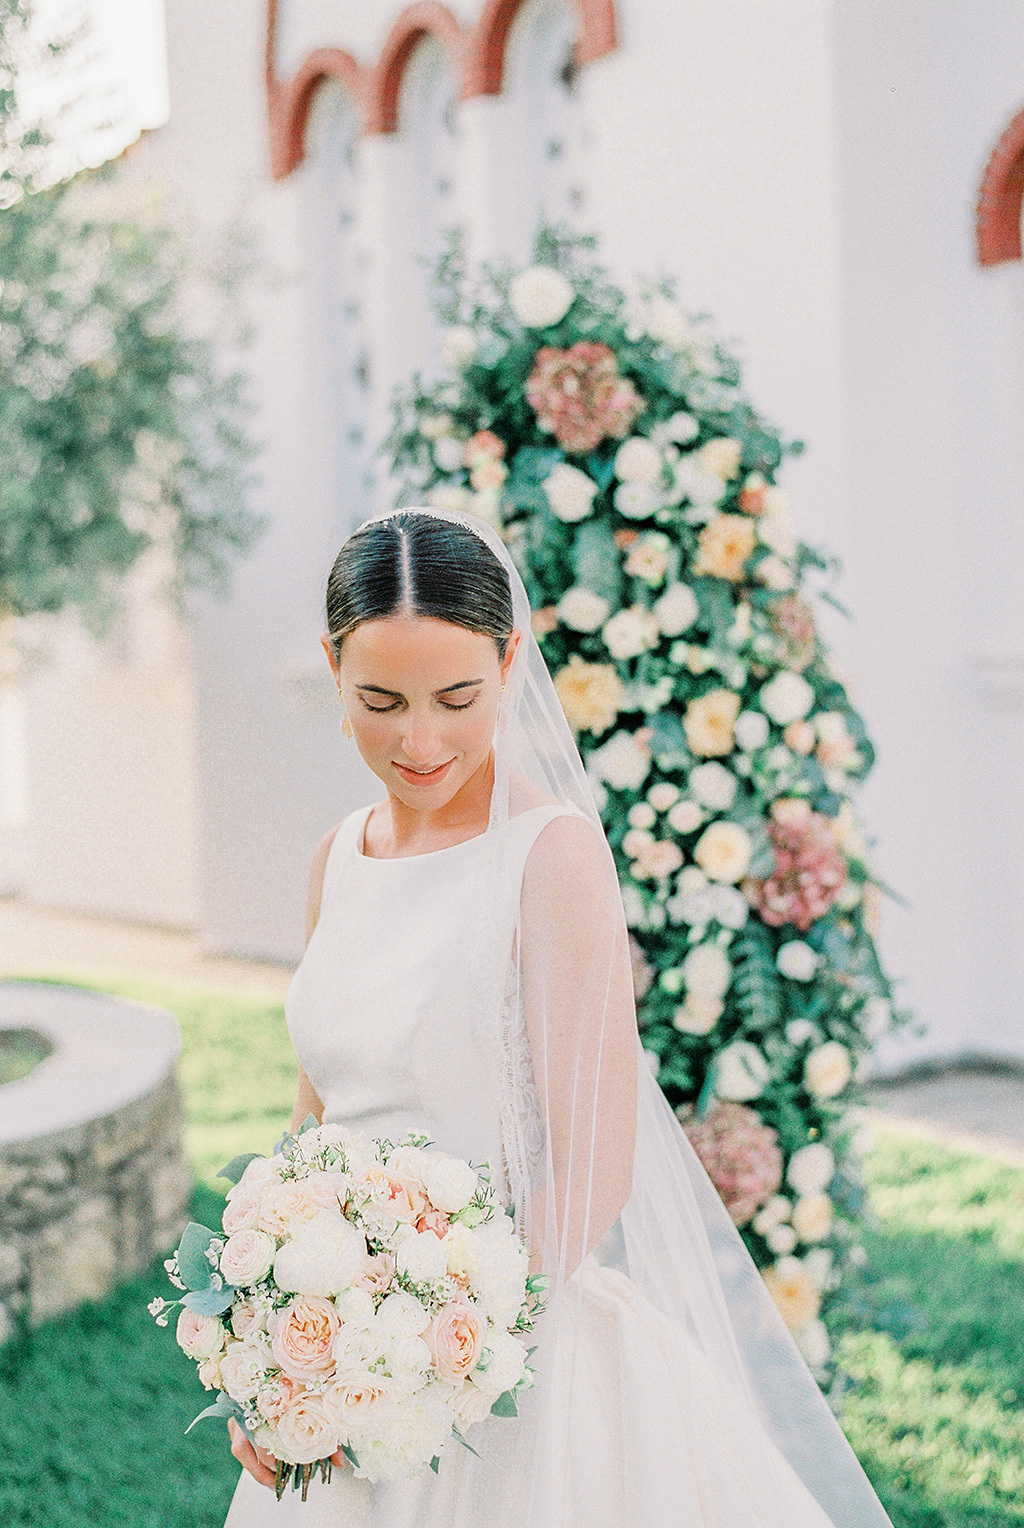 George Kostopoulos fine art wedding photography, film bridal post cermonial portrait in chalkidiki, Φωτογράφος γάμου Χαλκιδική, πορτραίτο νύφης με το νυφικό της μπουκέτο, λήψη με φιλμ,